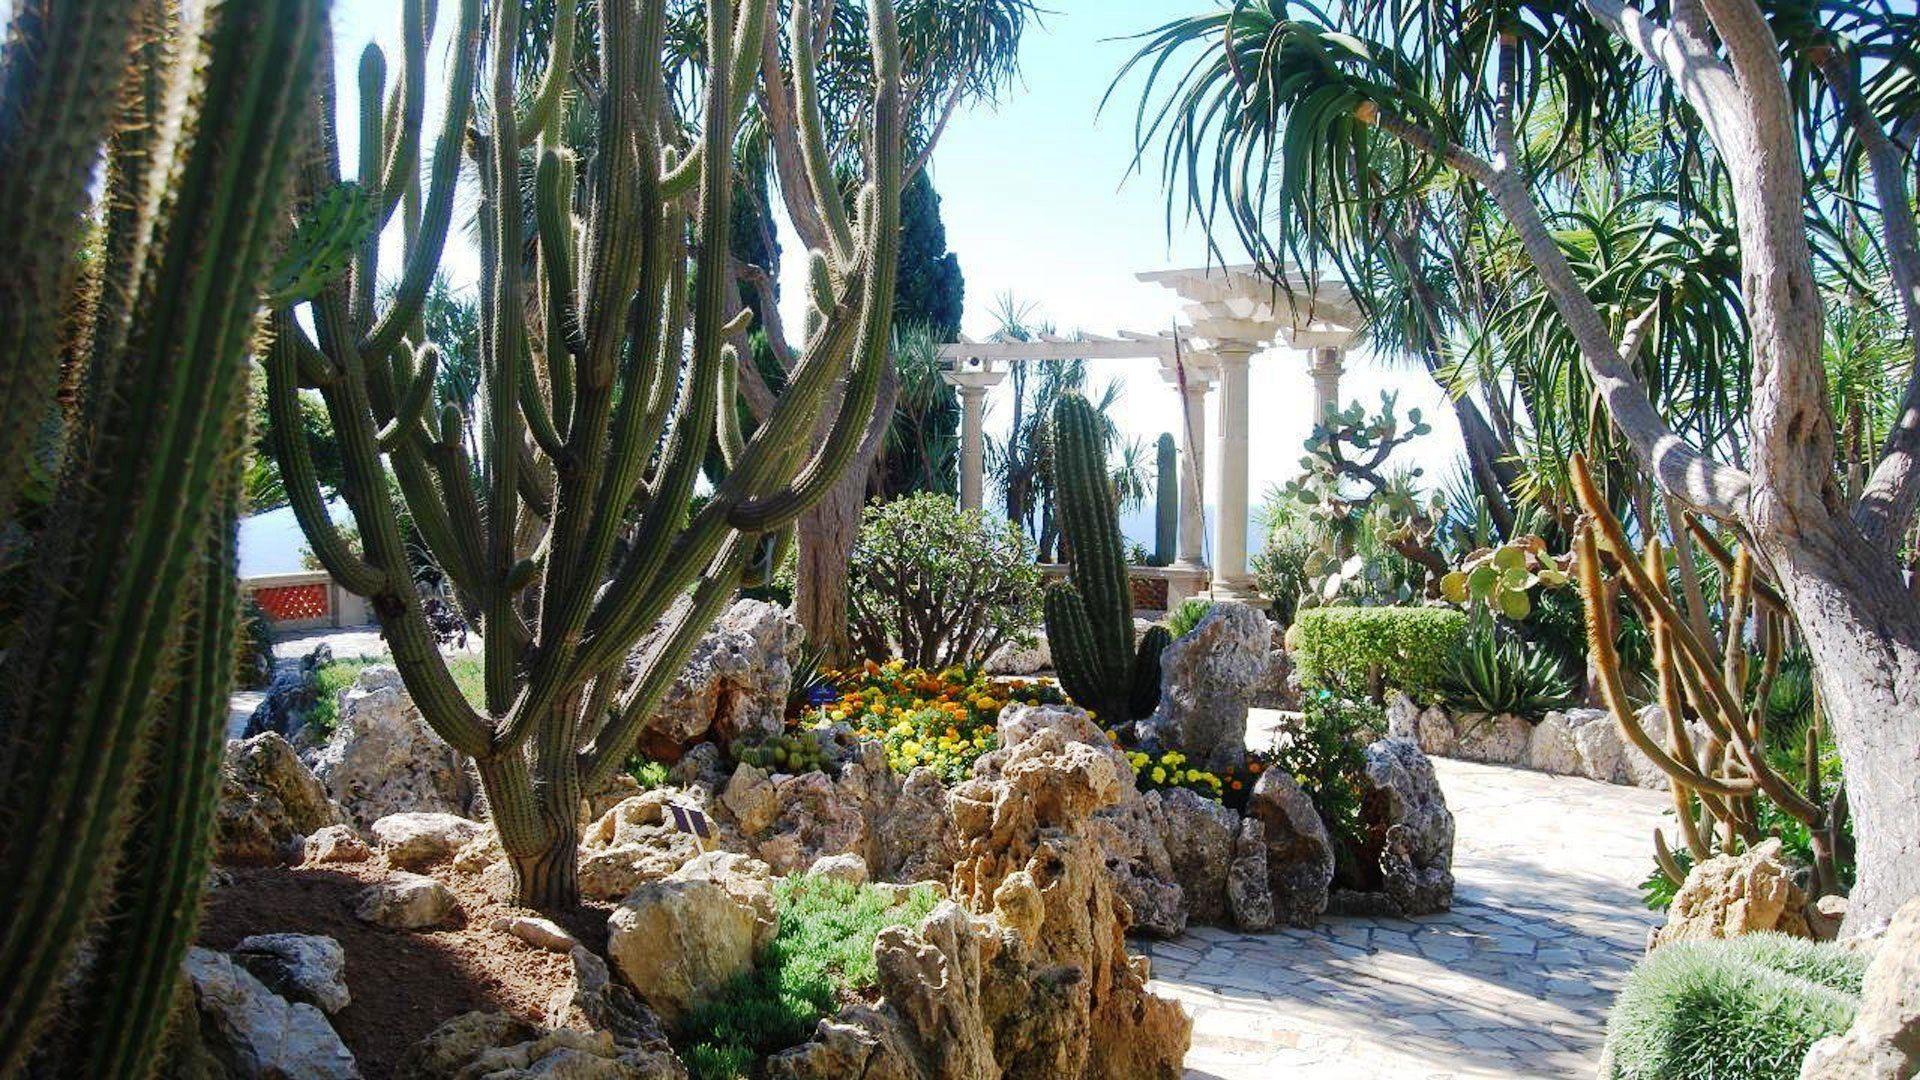 Jardin Exotique Tourism In Monaco